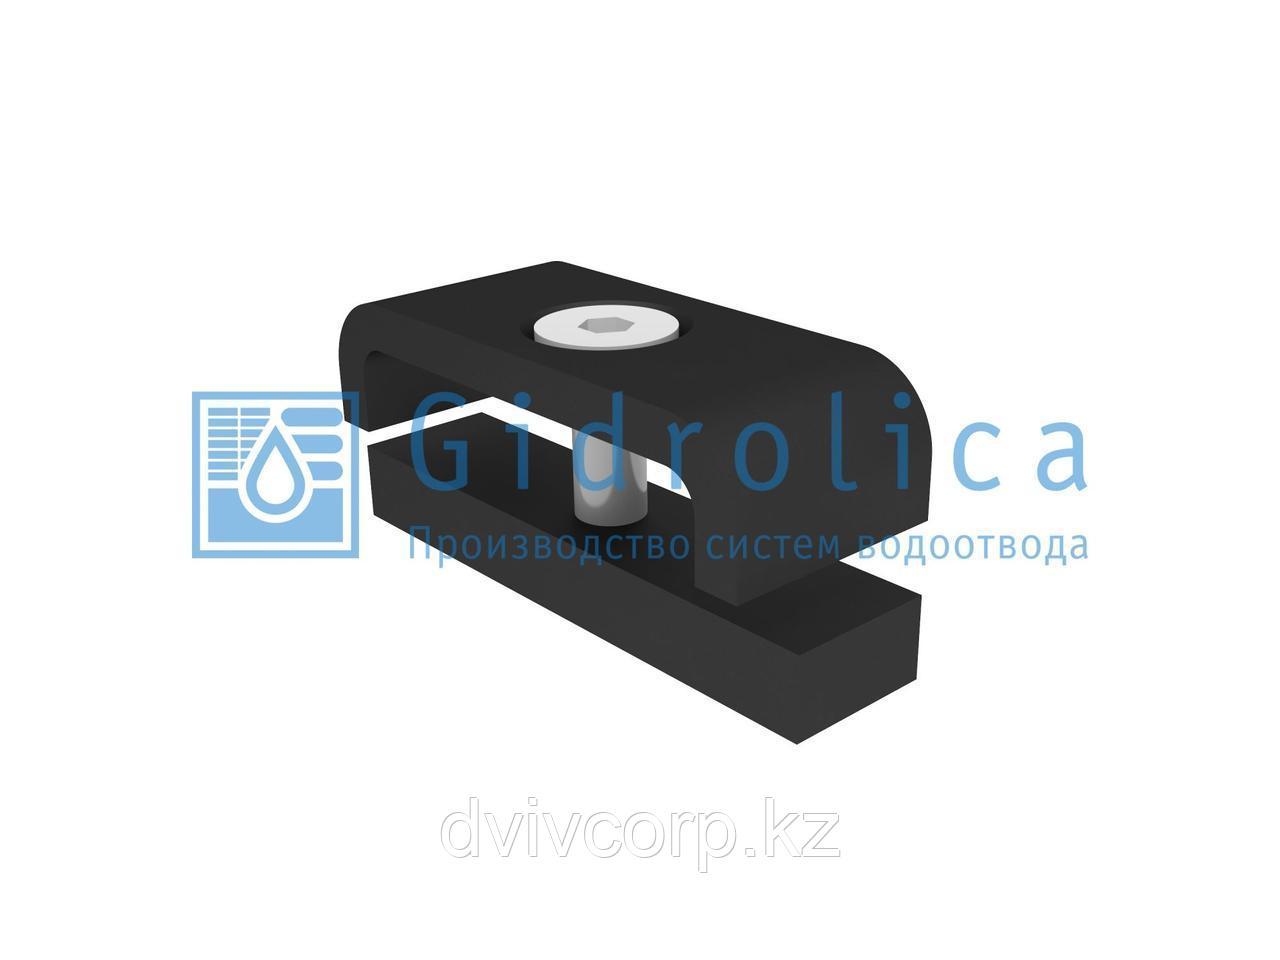 Арт. 103 Крепеж Gidrolica для чугунных решеток DN100